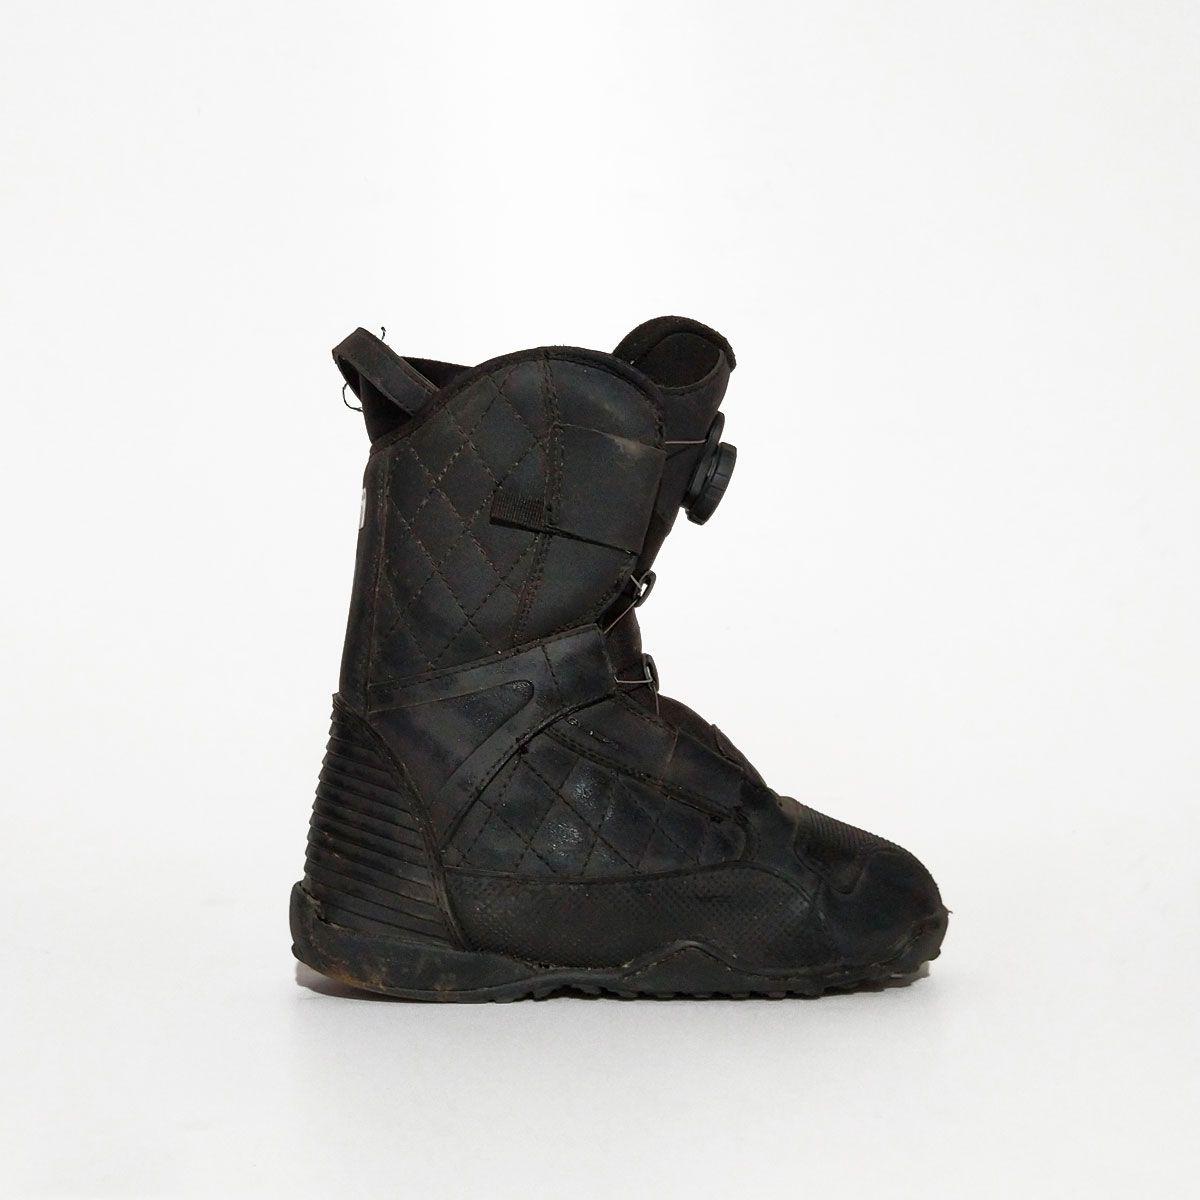 boots-snowboard-boa-1